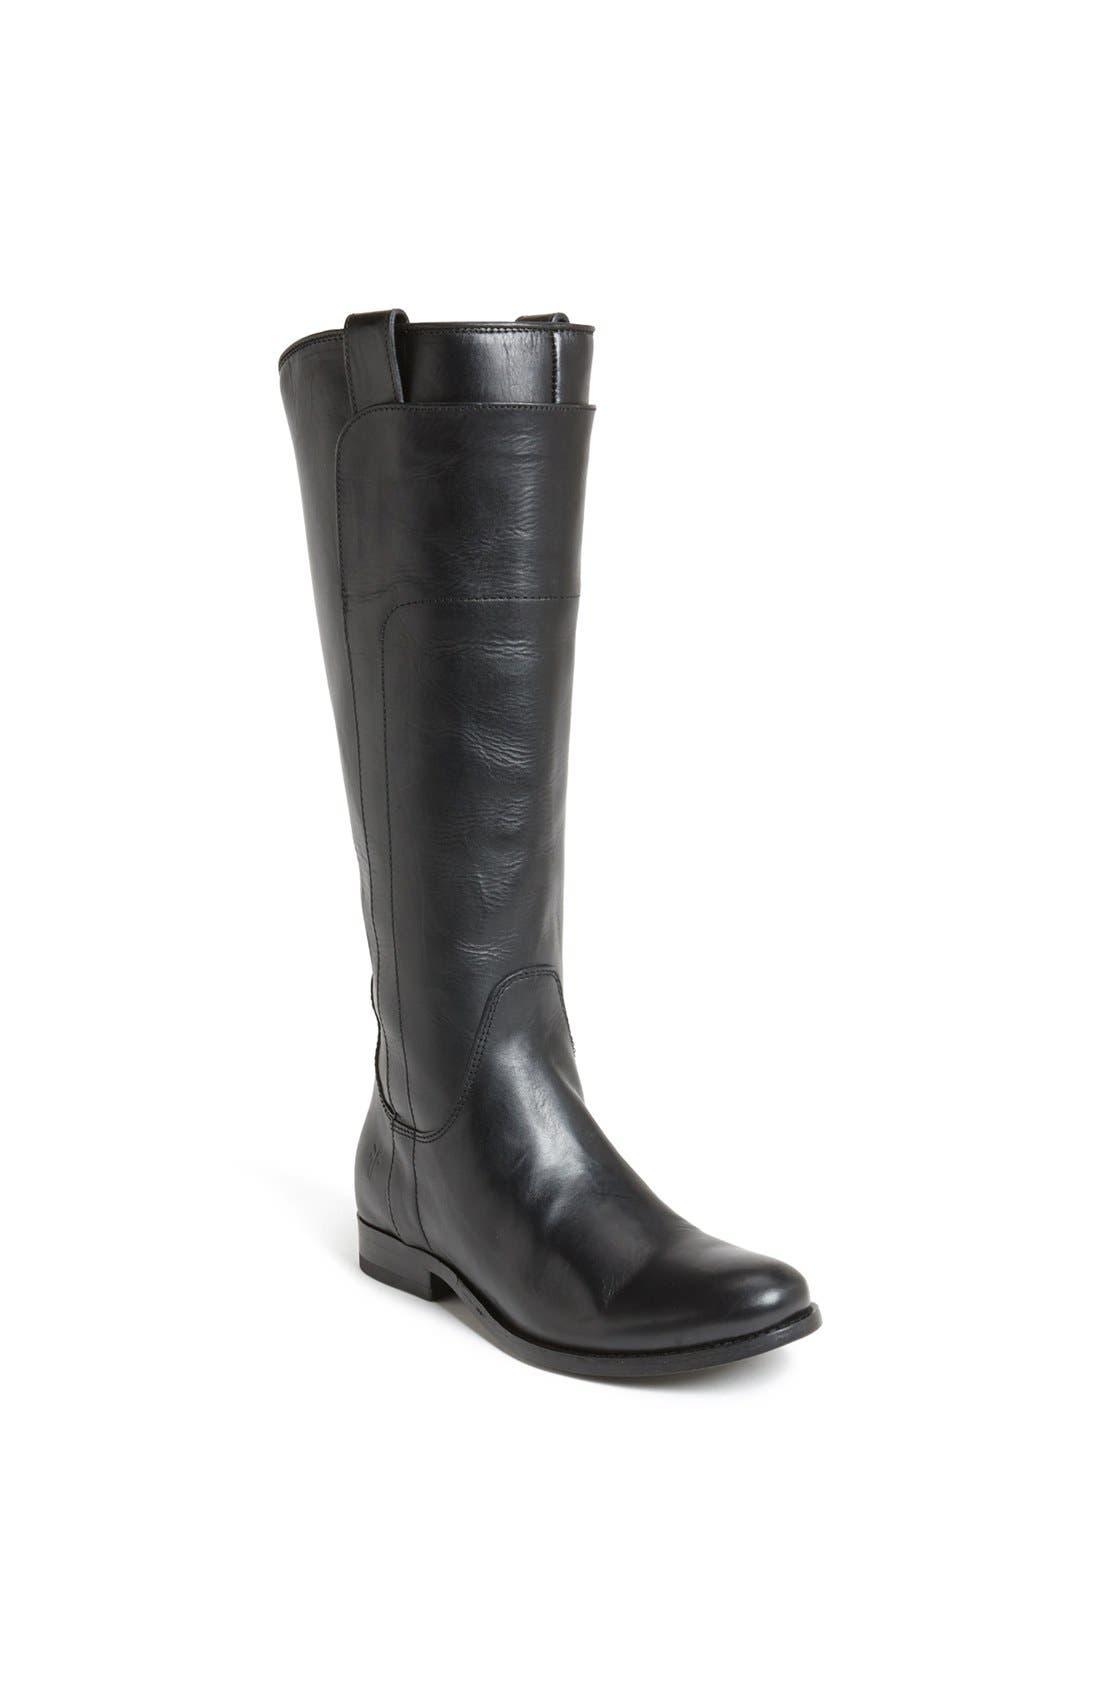 Alternate Image 1 Selected - Frye 'Melissa' Riding Boot